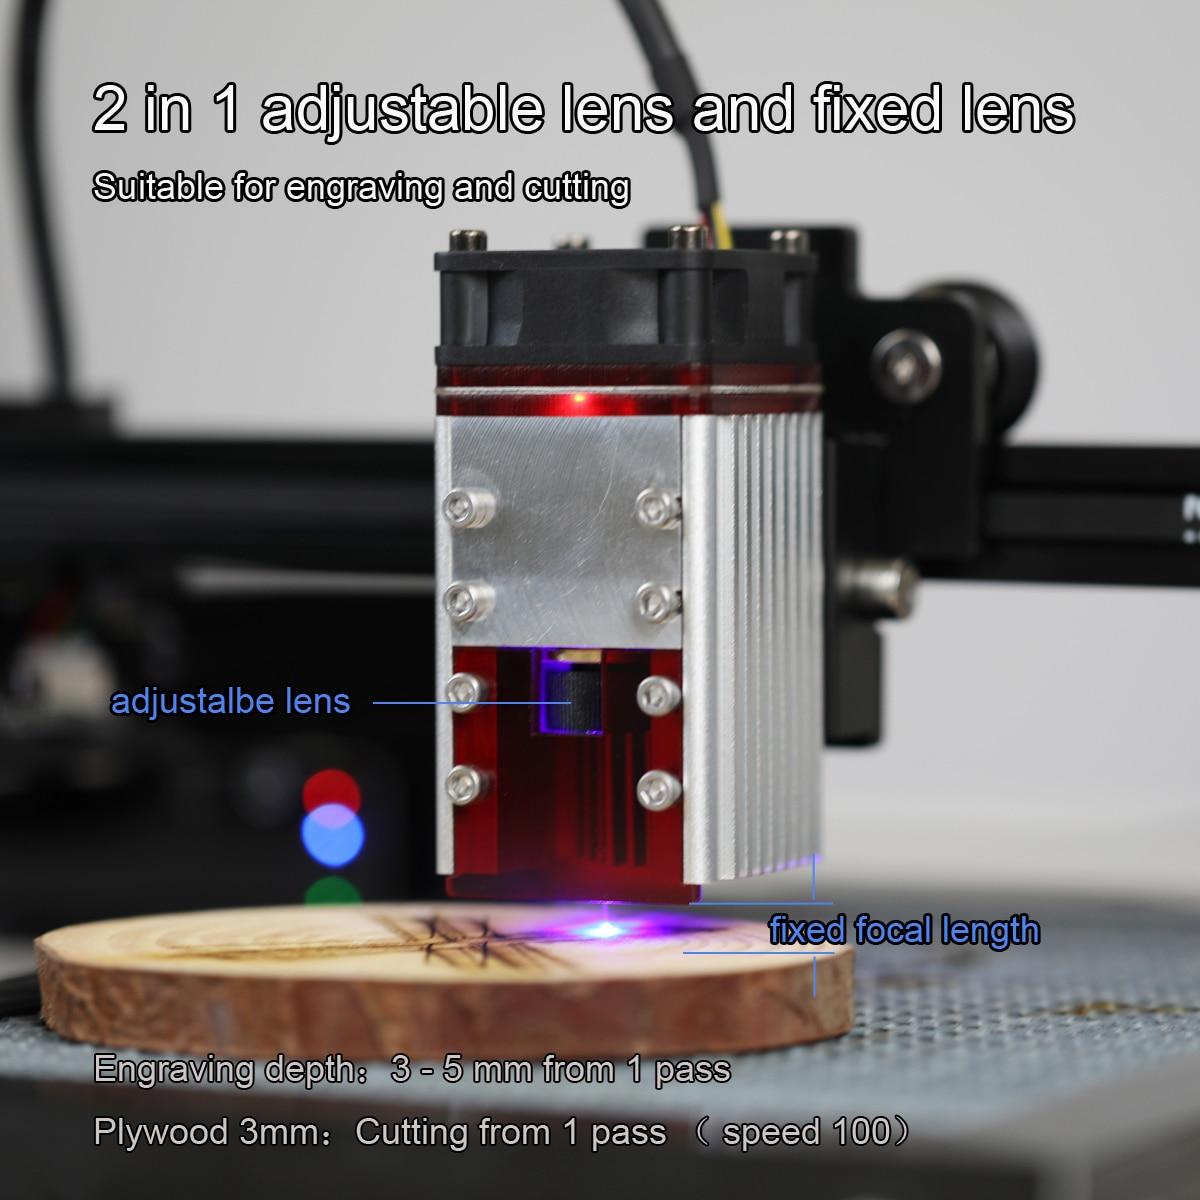 NEJE Master 2s Plus 40W/80W CNC Laser Engraving Machine Wood/Metal Fast Engraver Laser Cutting Tool with App Control- Lightburn enlarge